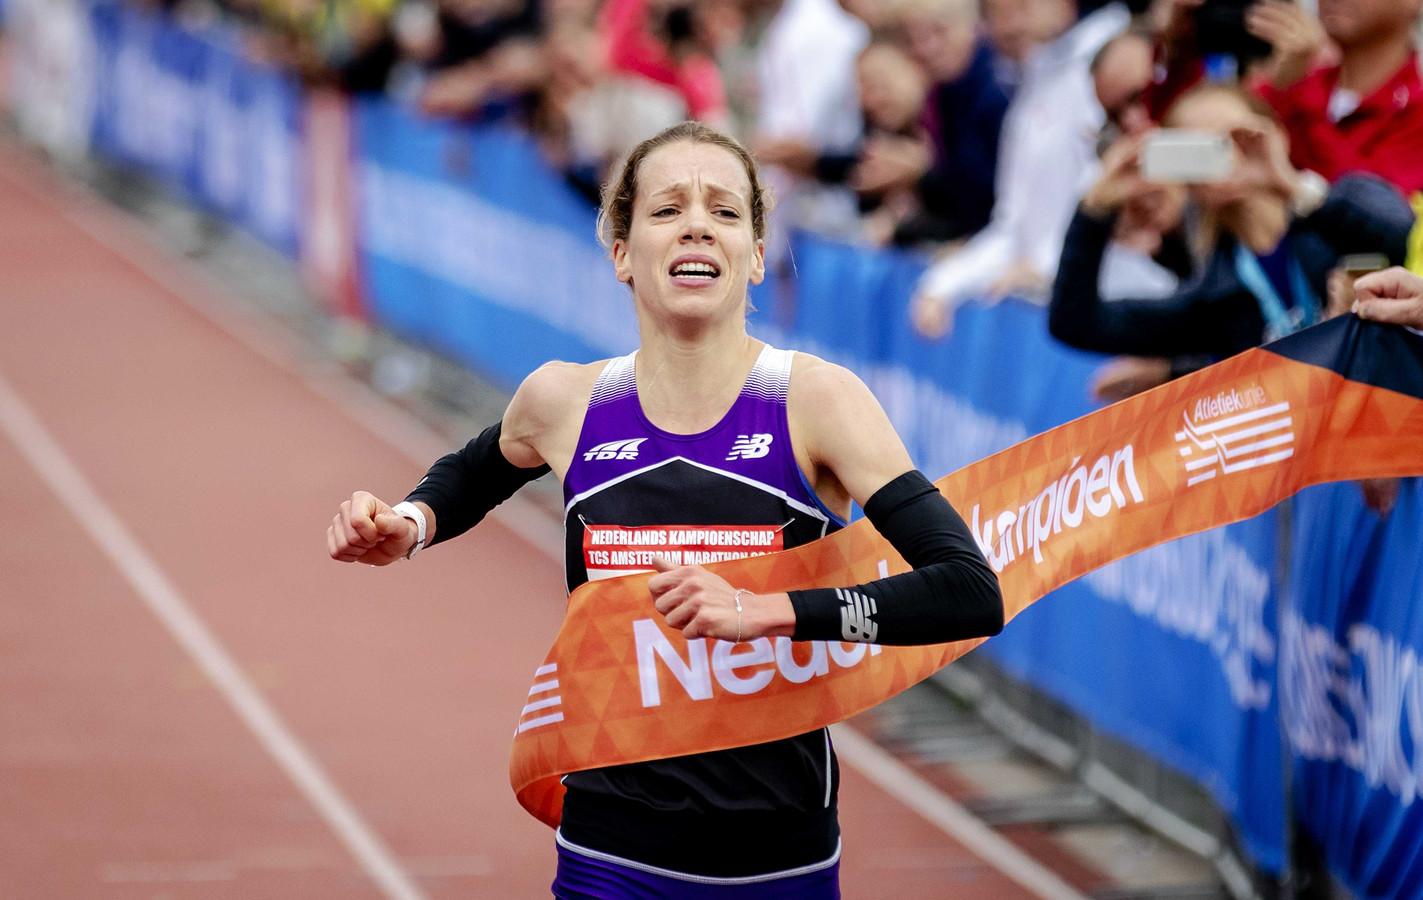 Bo Ummels komt als eerste Nederlanderse vrouw over de finish.